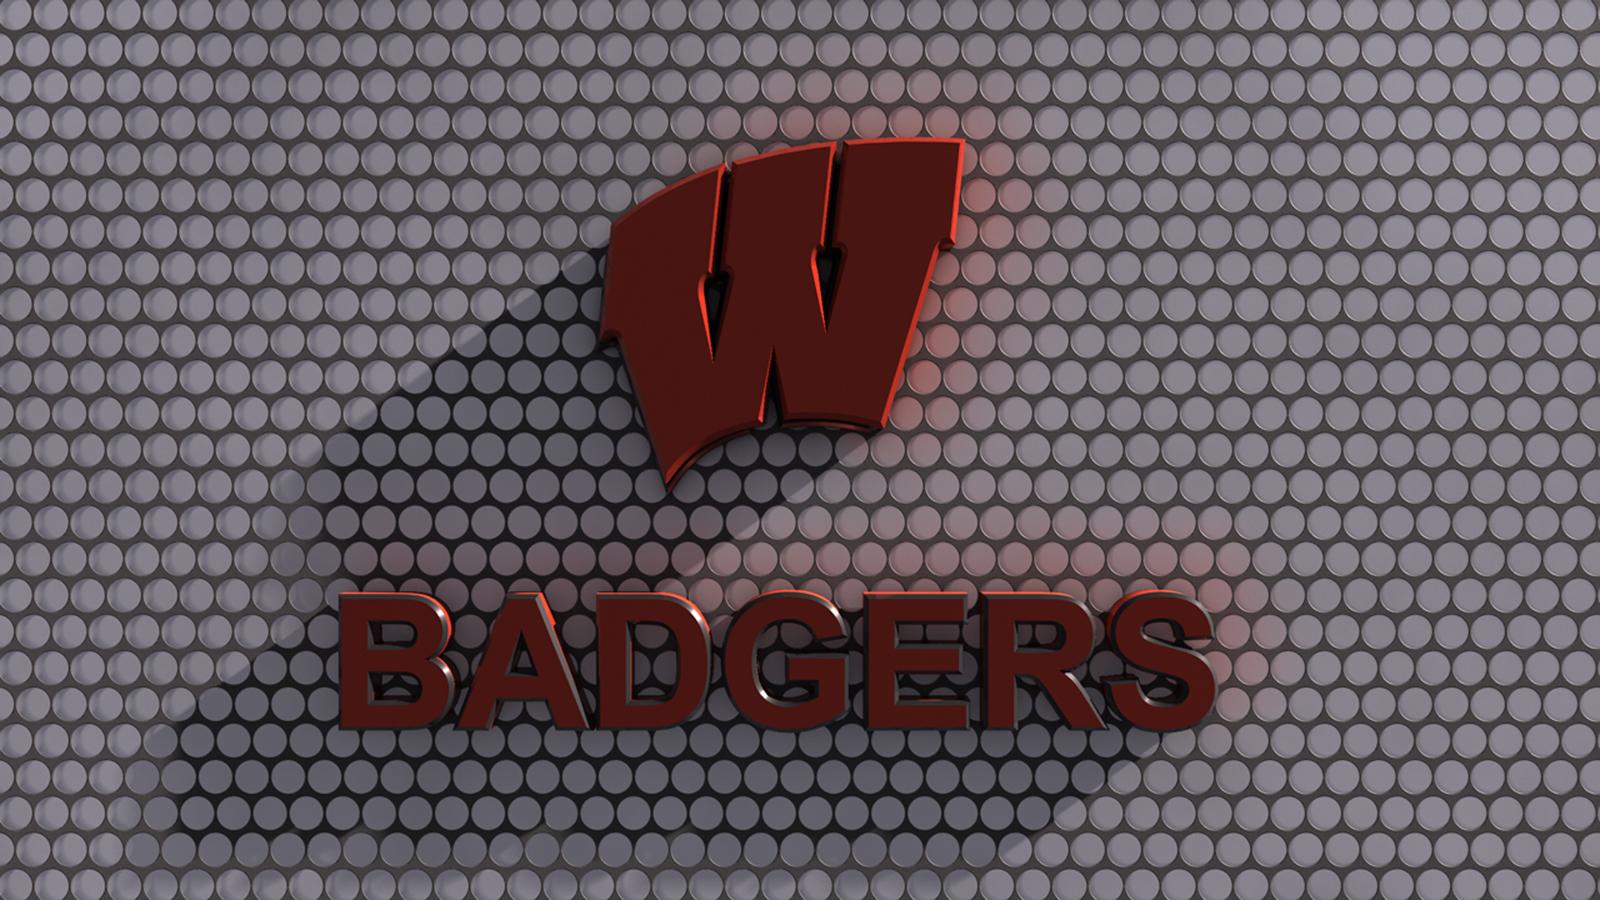 Sun Prairie Wisconsin Weather   Badgers Wallpaper 1600x900